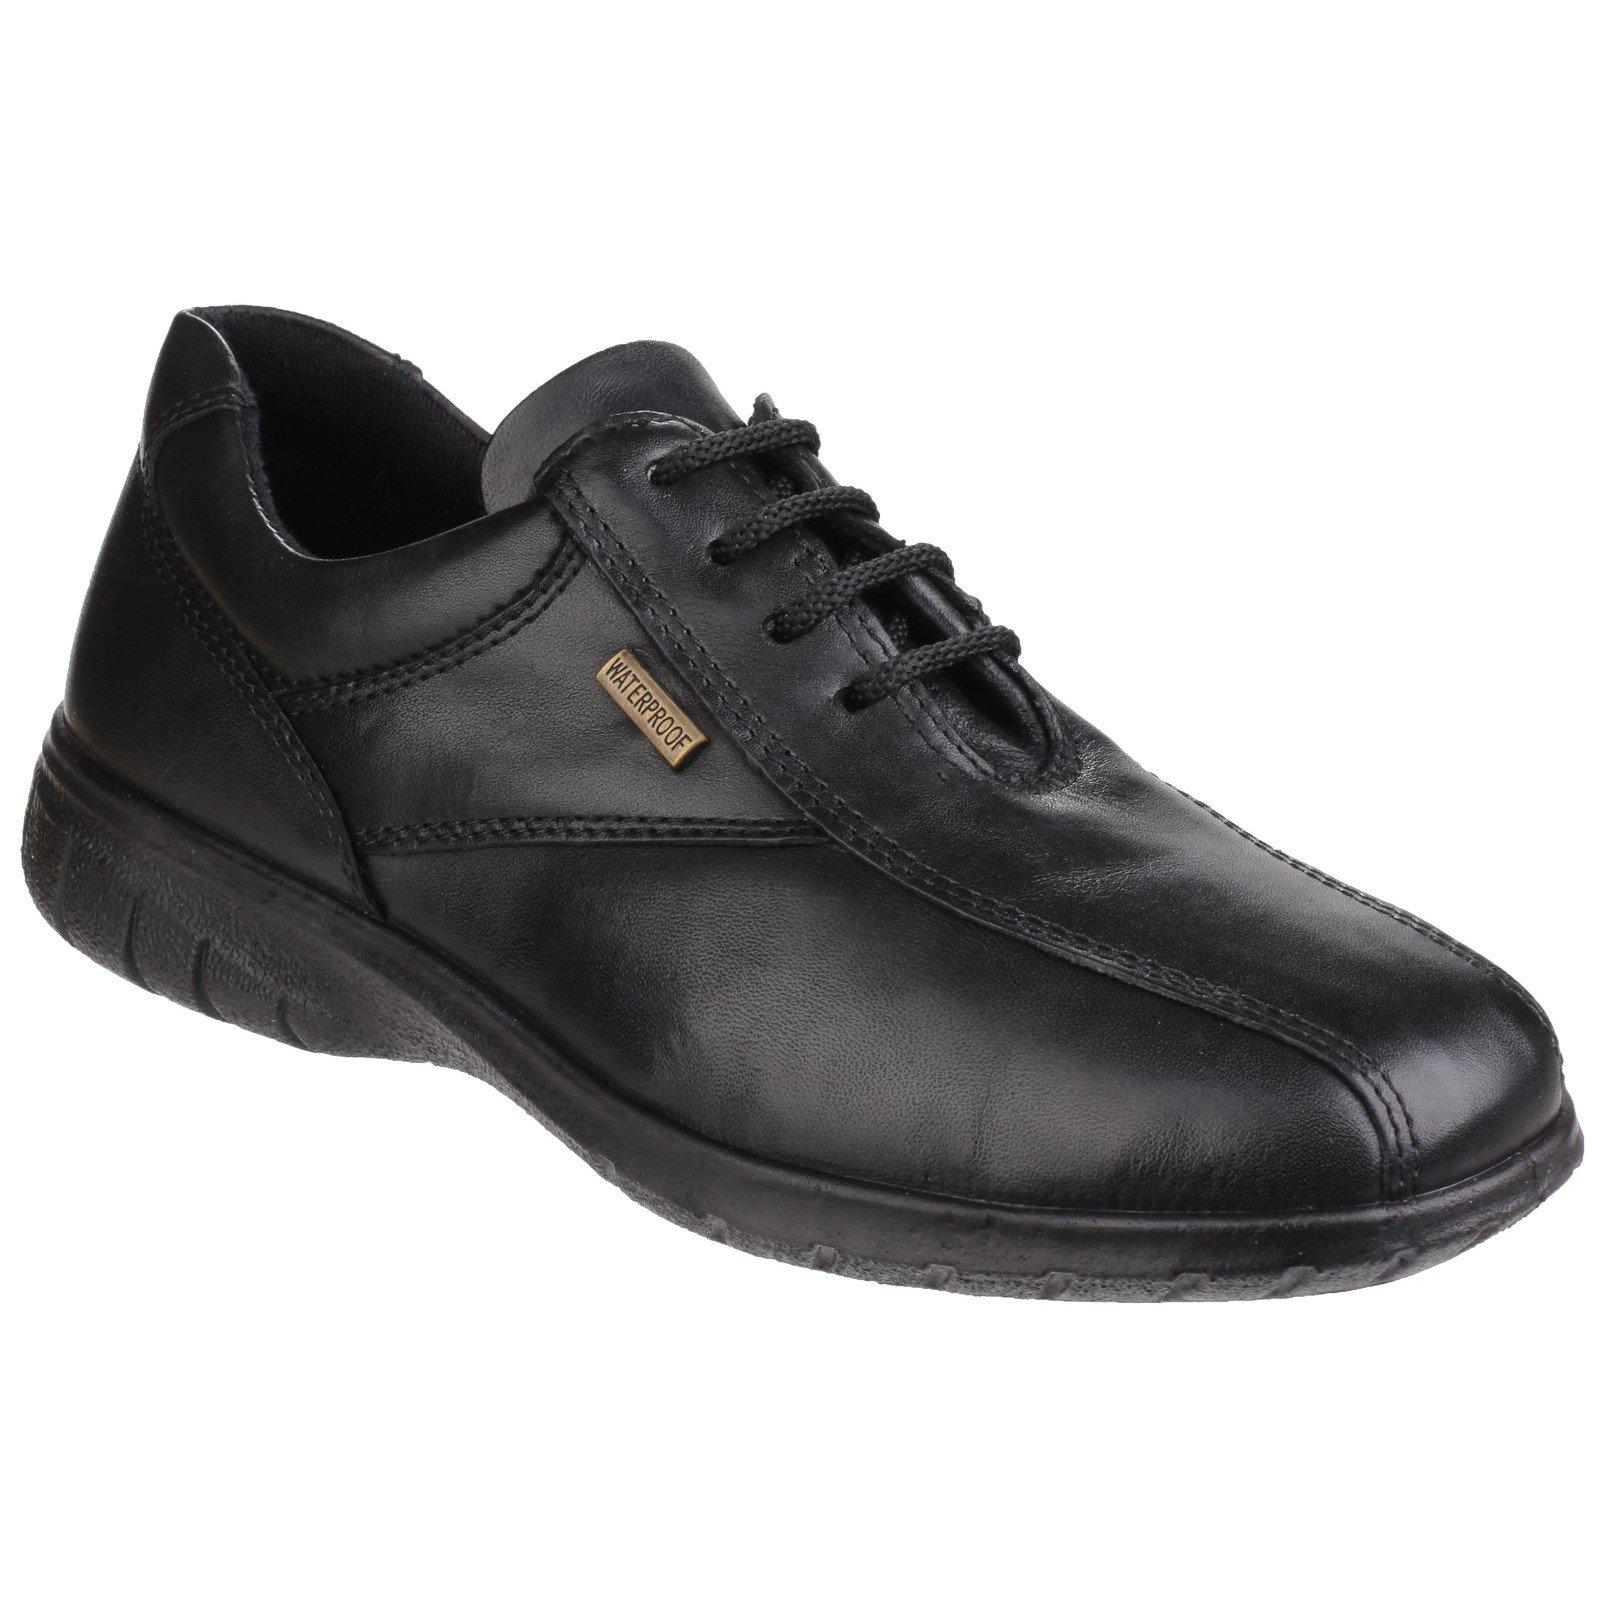 Cotswold Women's Collection Salford Shoe Various Colours 32981 - Black 4